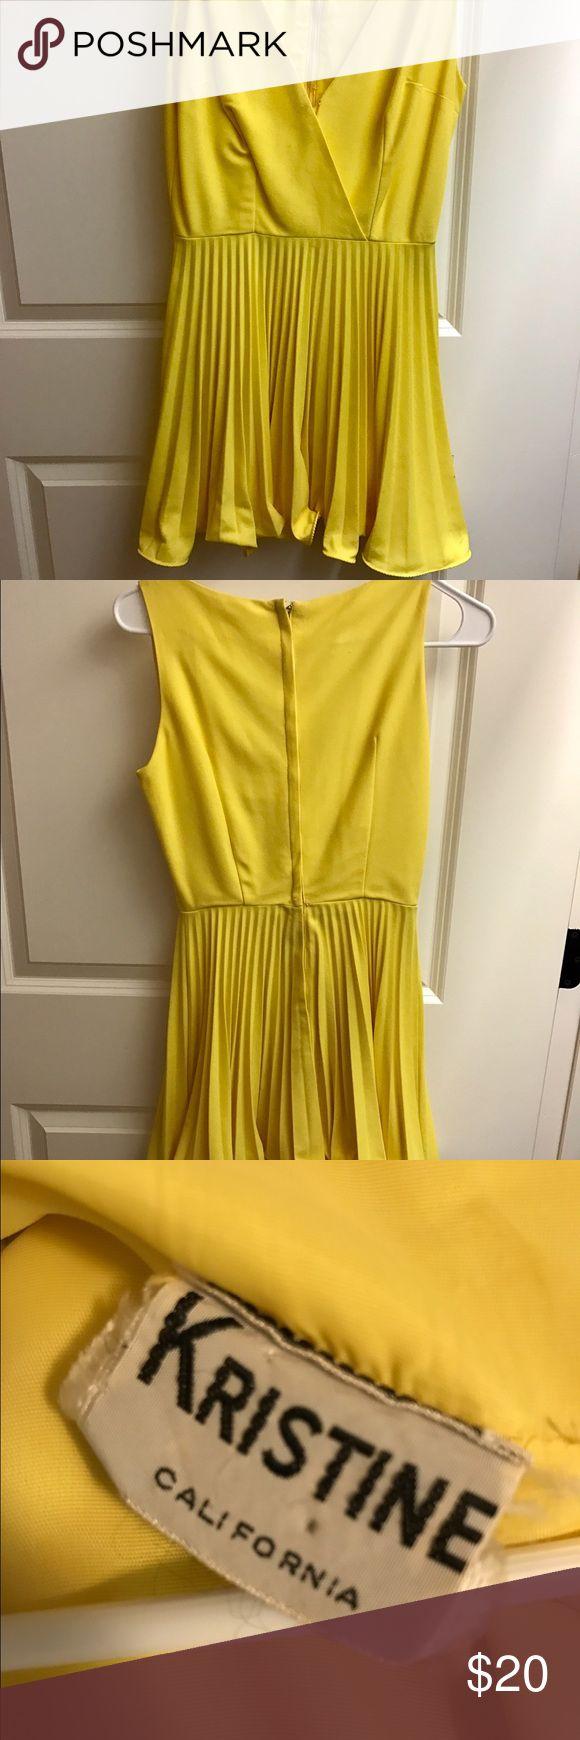 Elegant Weekend Sale Vintage Yellow Dress Brand Kristine Size Small